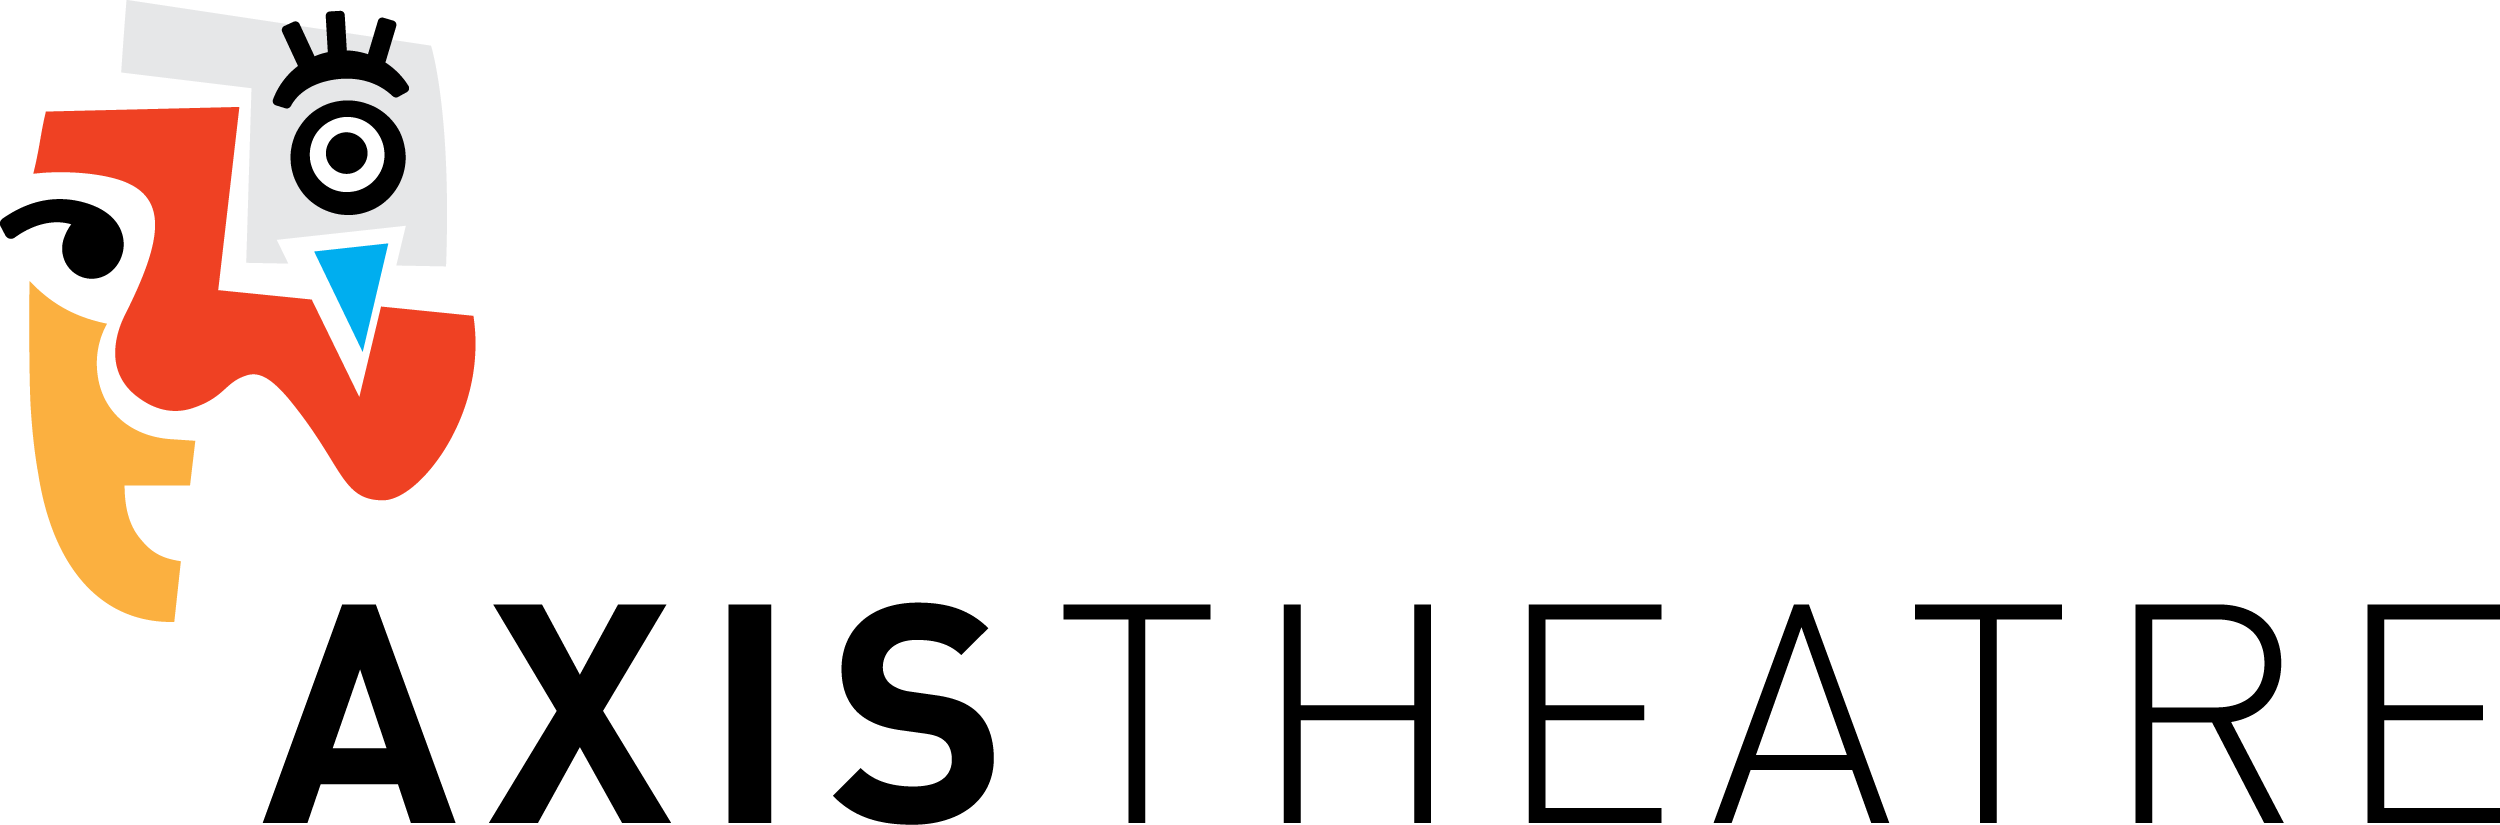 Axis_Horizontal_RGB.png